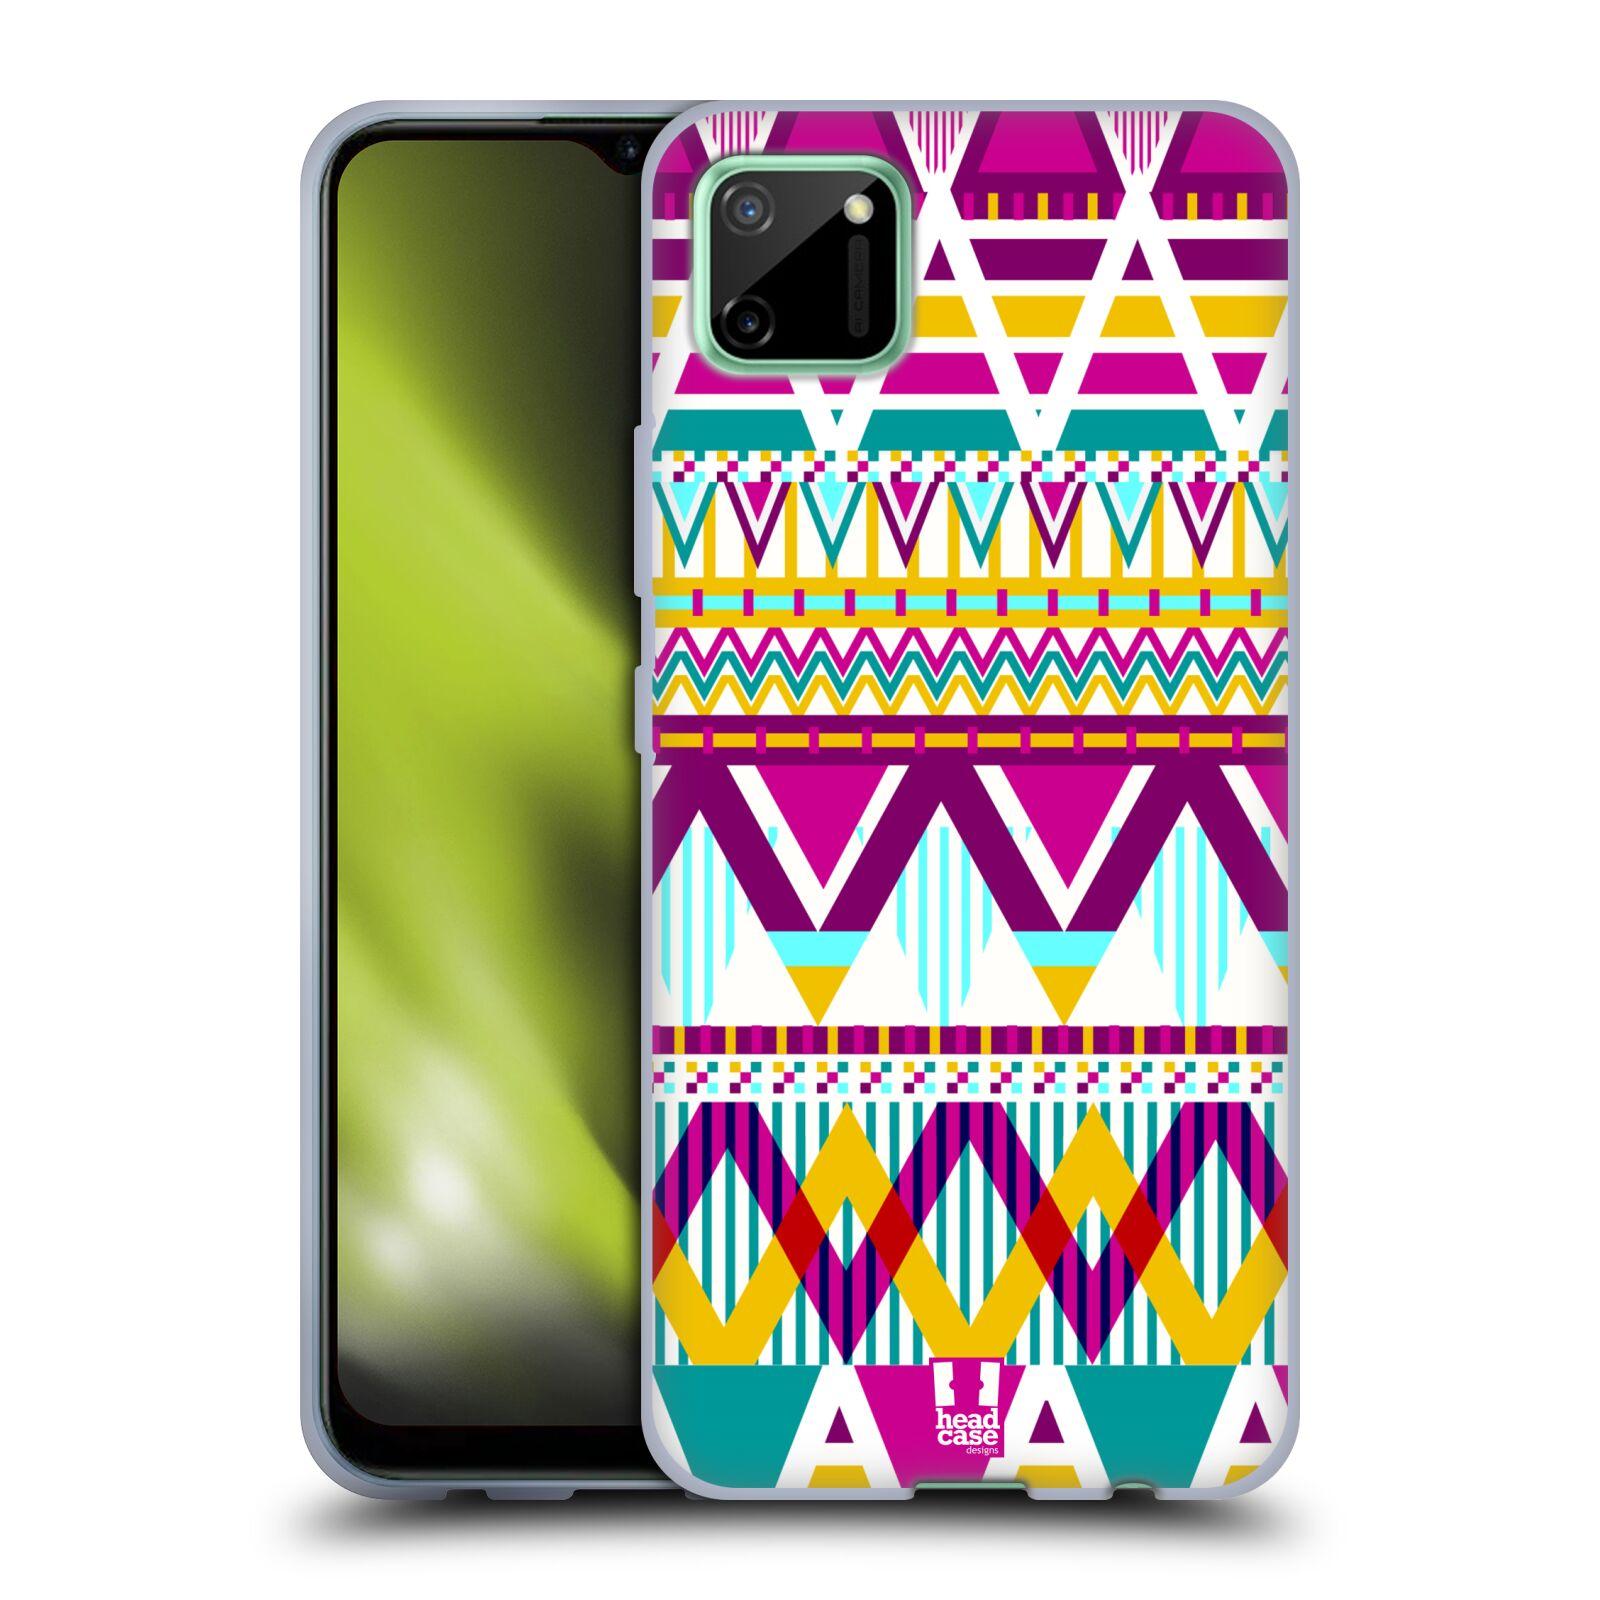 Silikonové pouzdro na mobil Realme C11 - Head Case - AZTEC SUGARED